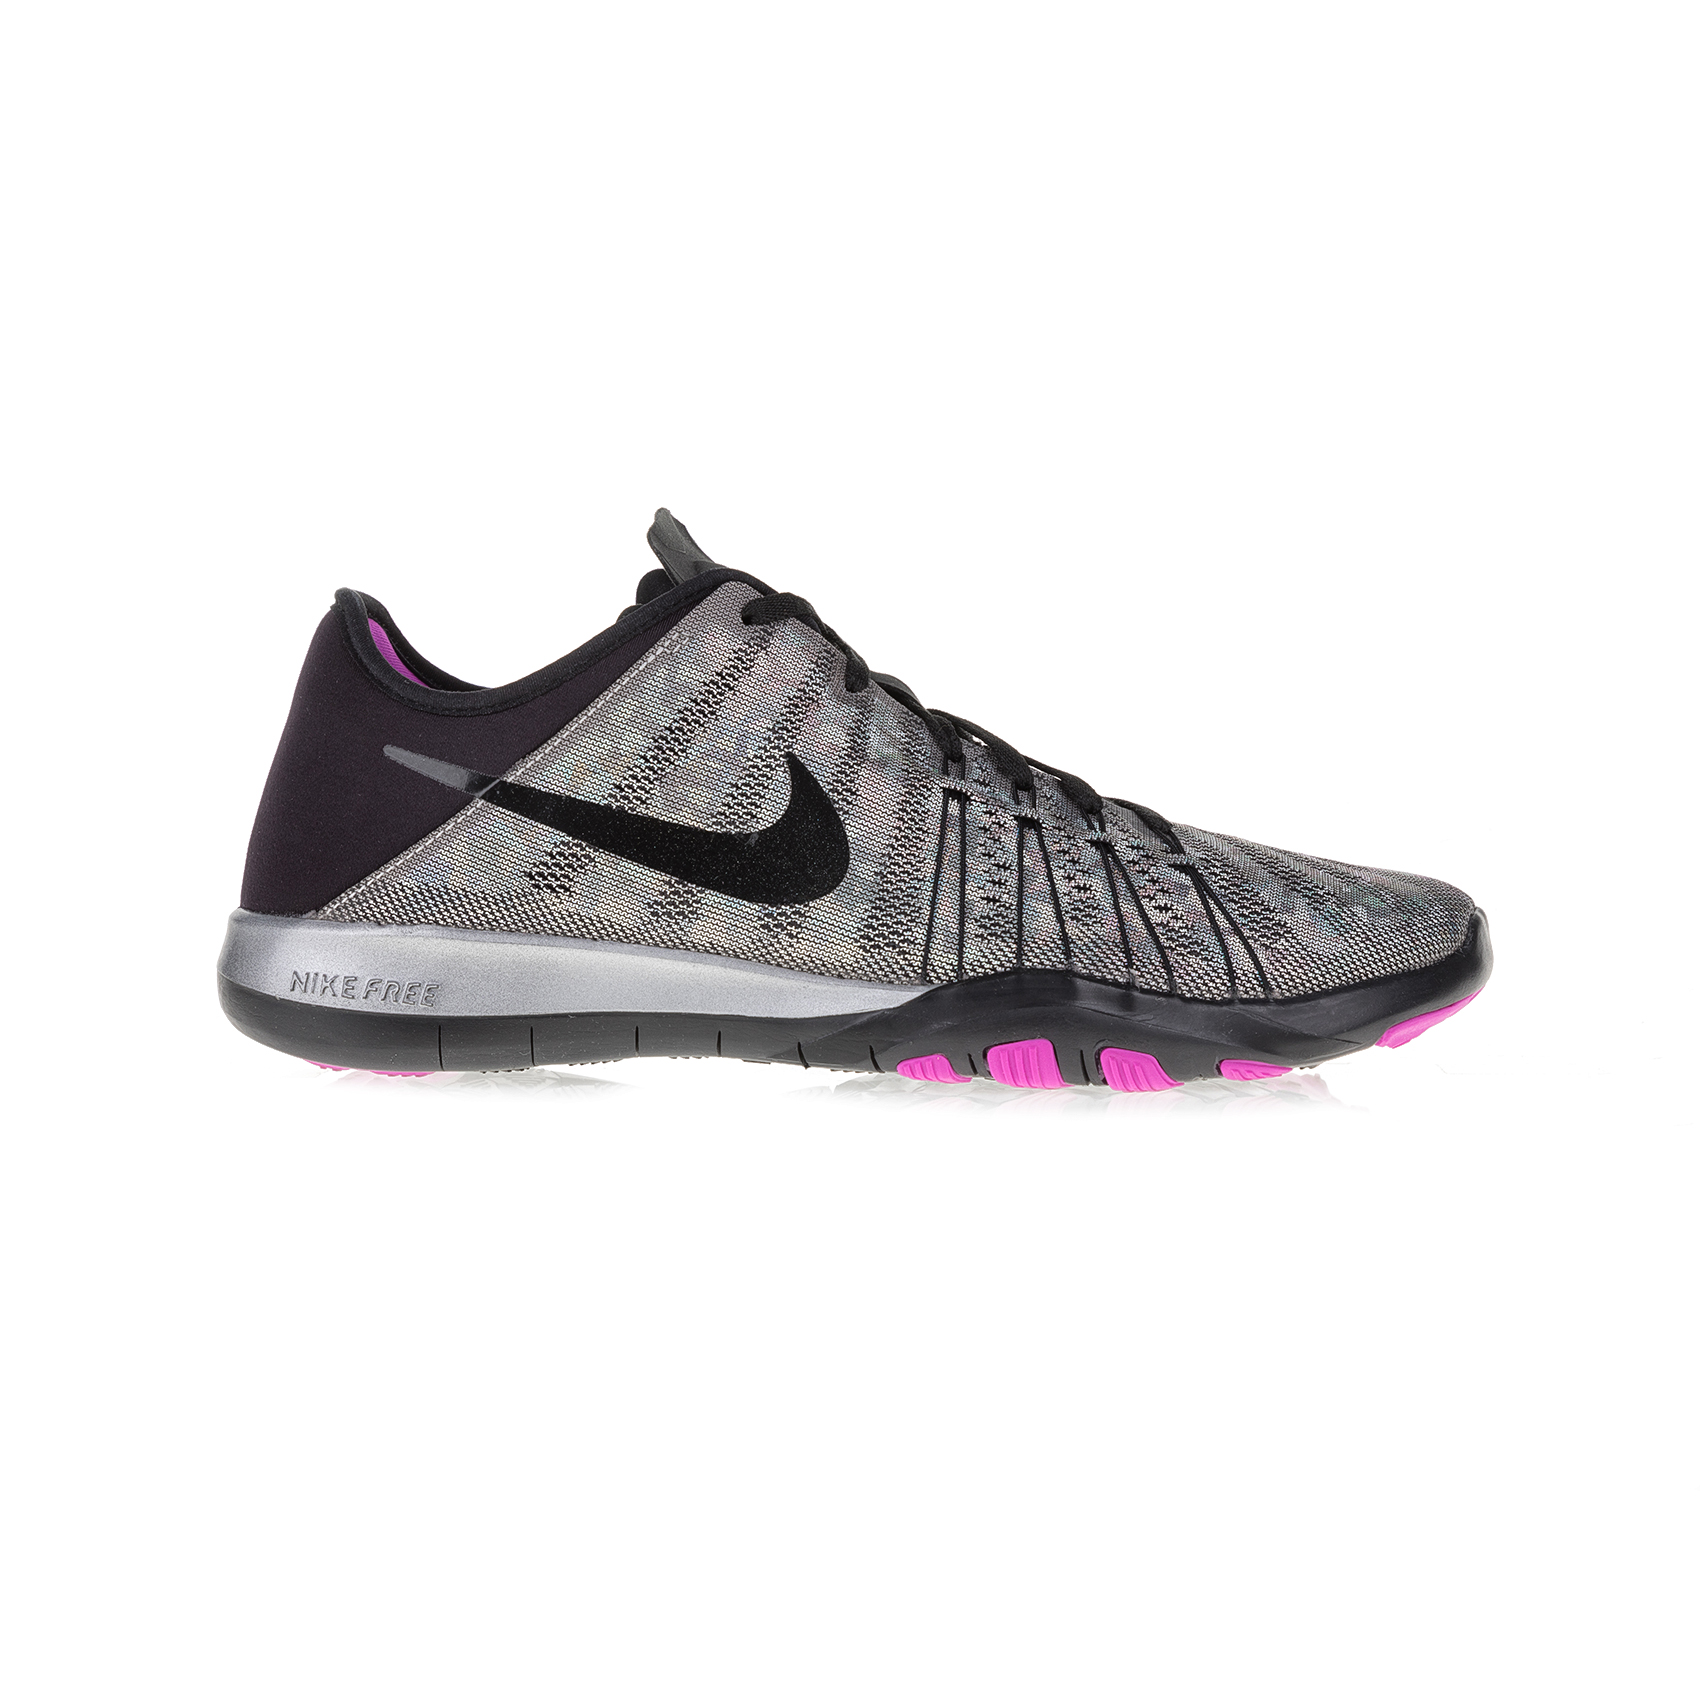 NIKE – Γυναικεία αθλητικά παπούτσια NIKE FREE TR 6 MTLC γκρι-μοβ